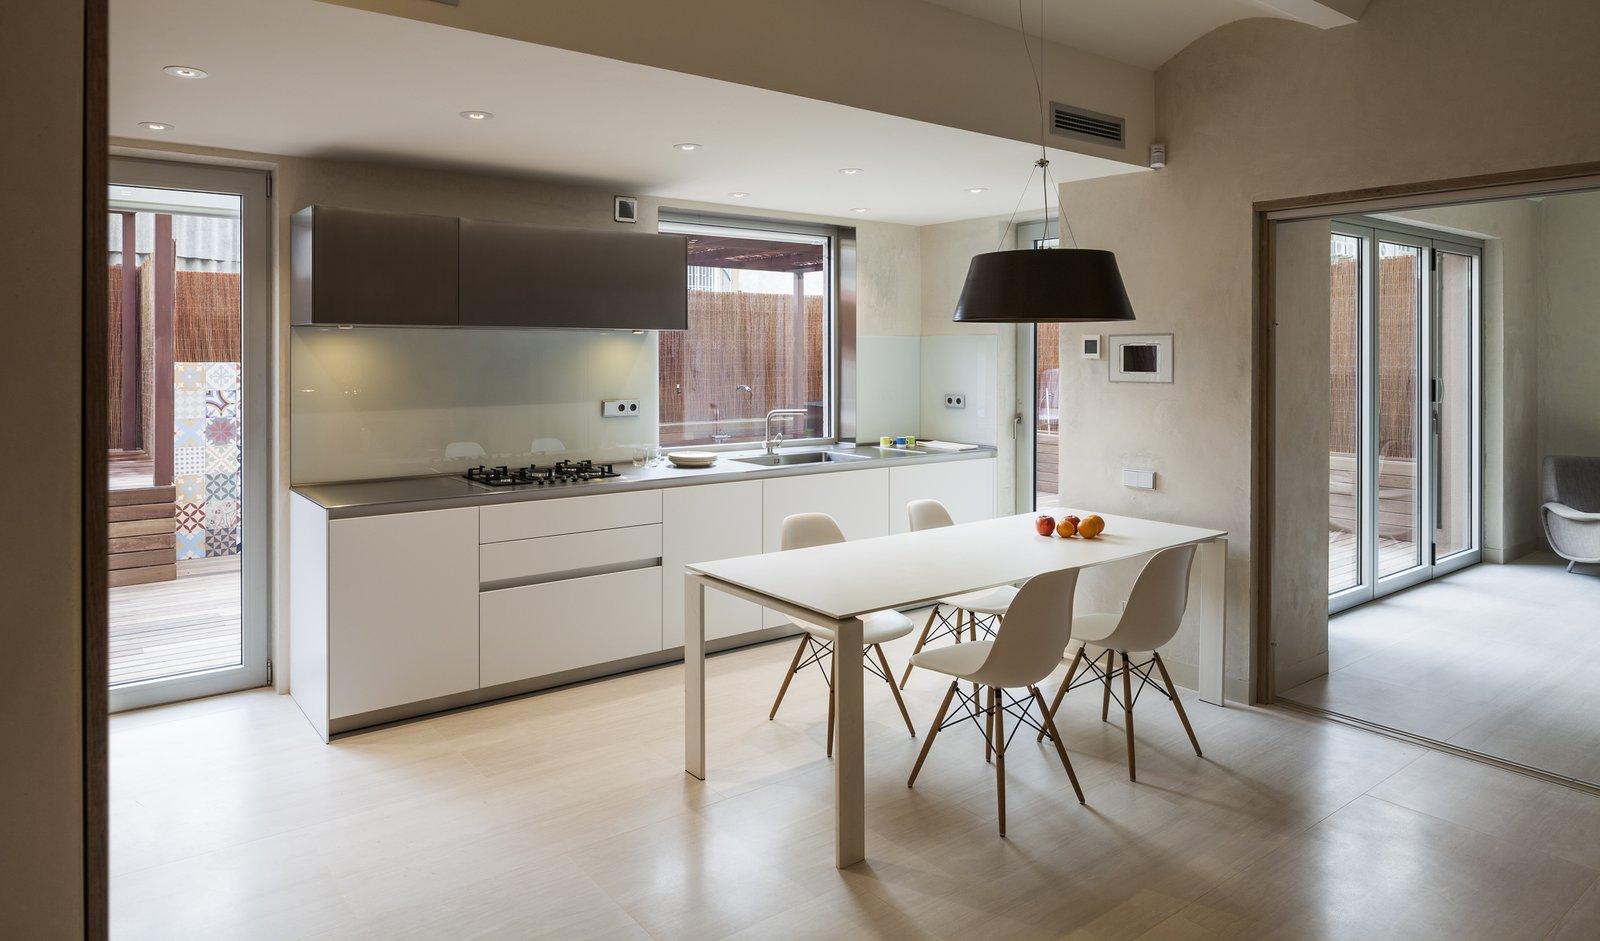 Duplex in Gracia-open kitchen